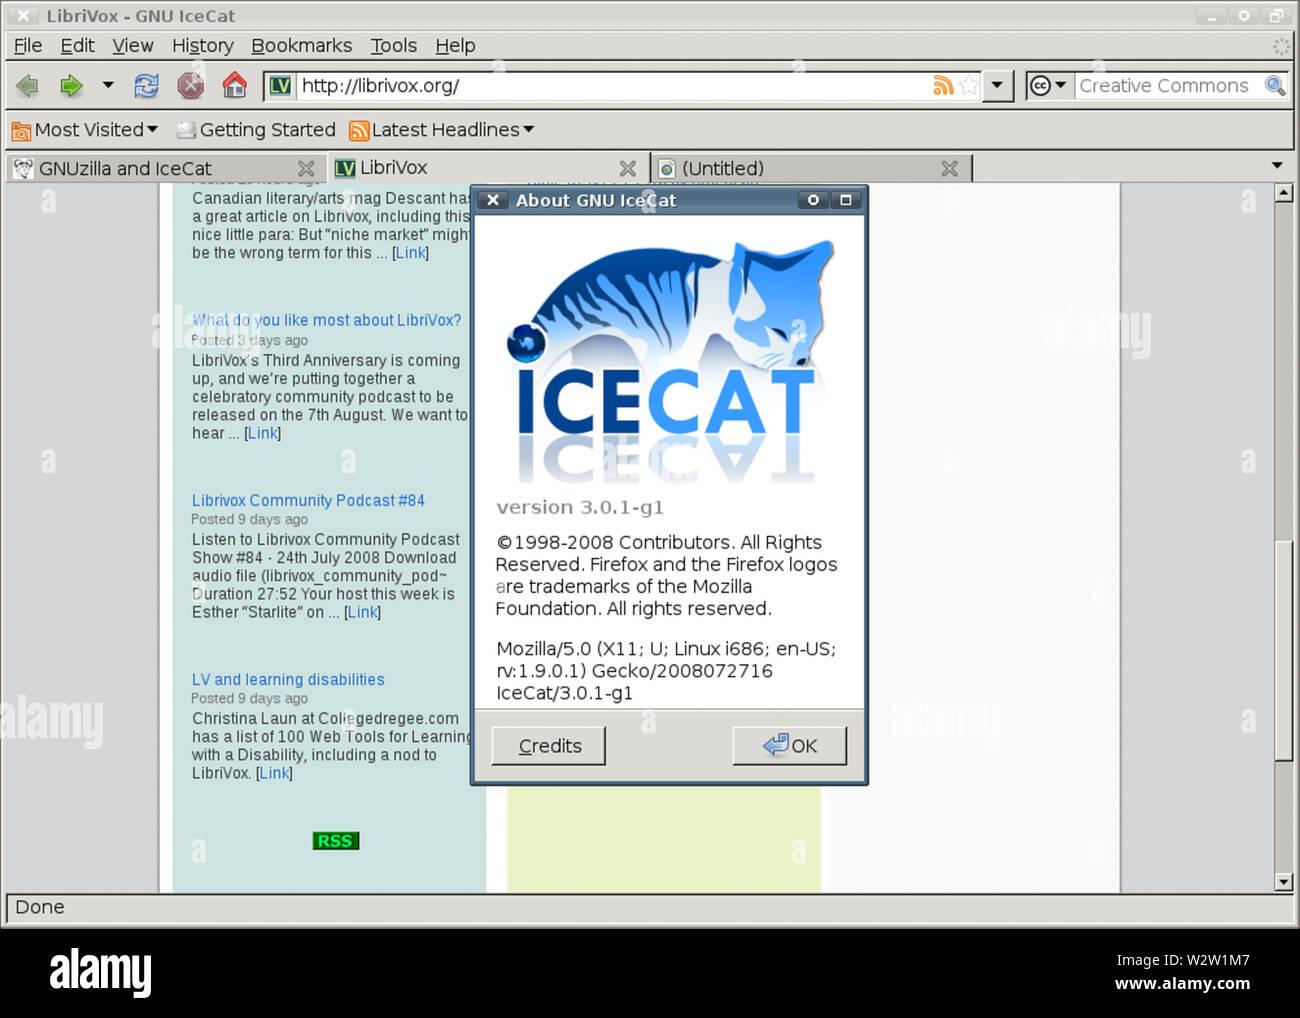 GNU IceCat 301-g1 about lhe - Stock Image